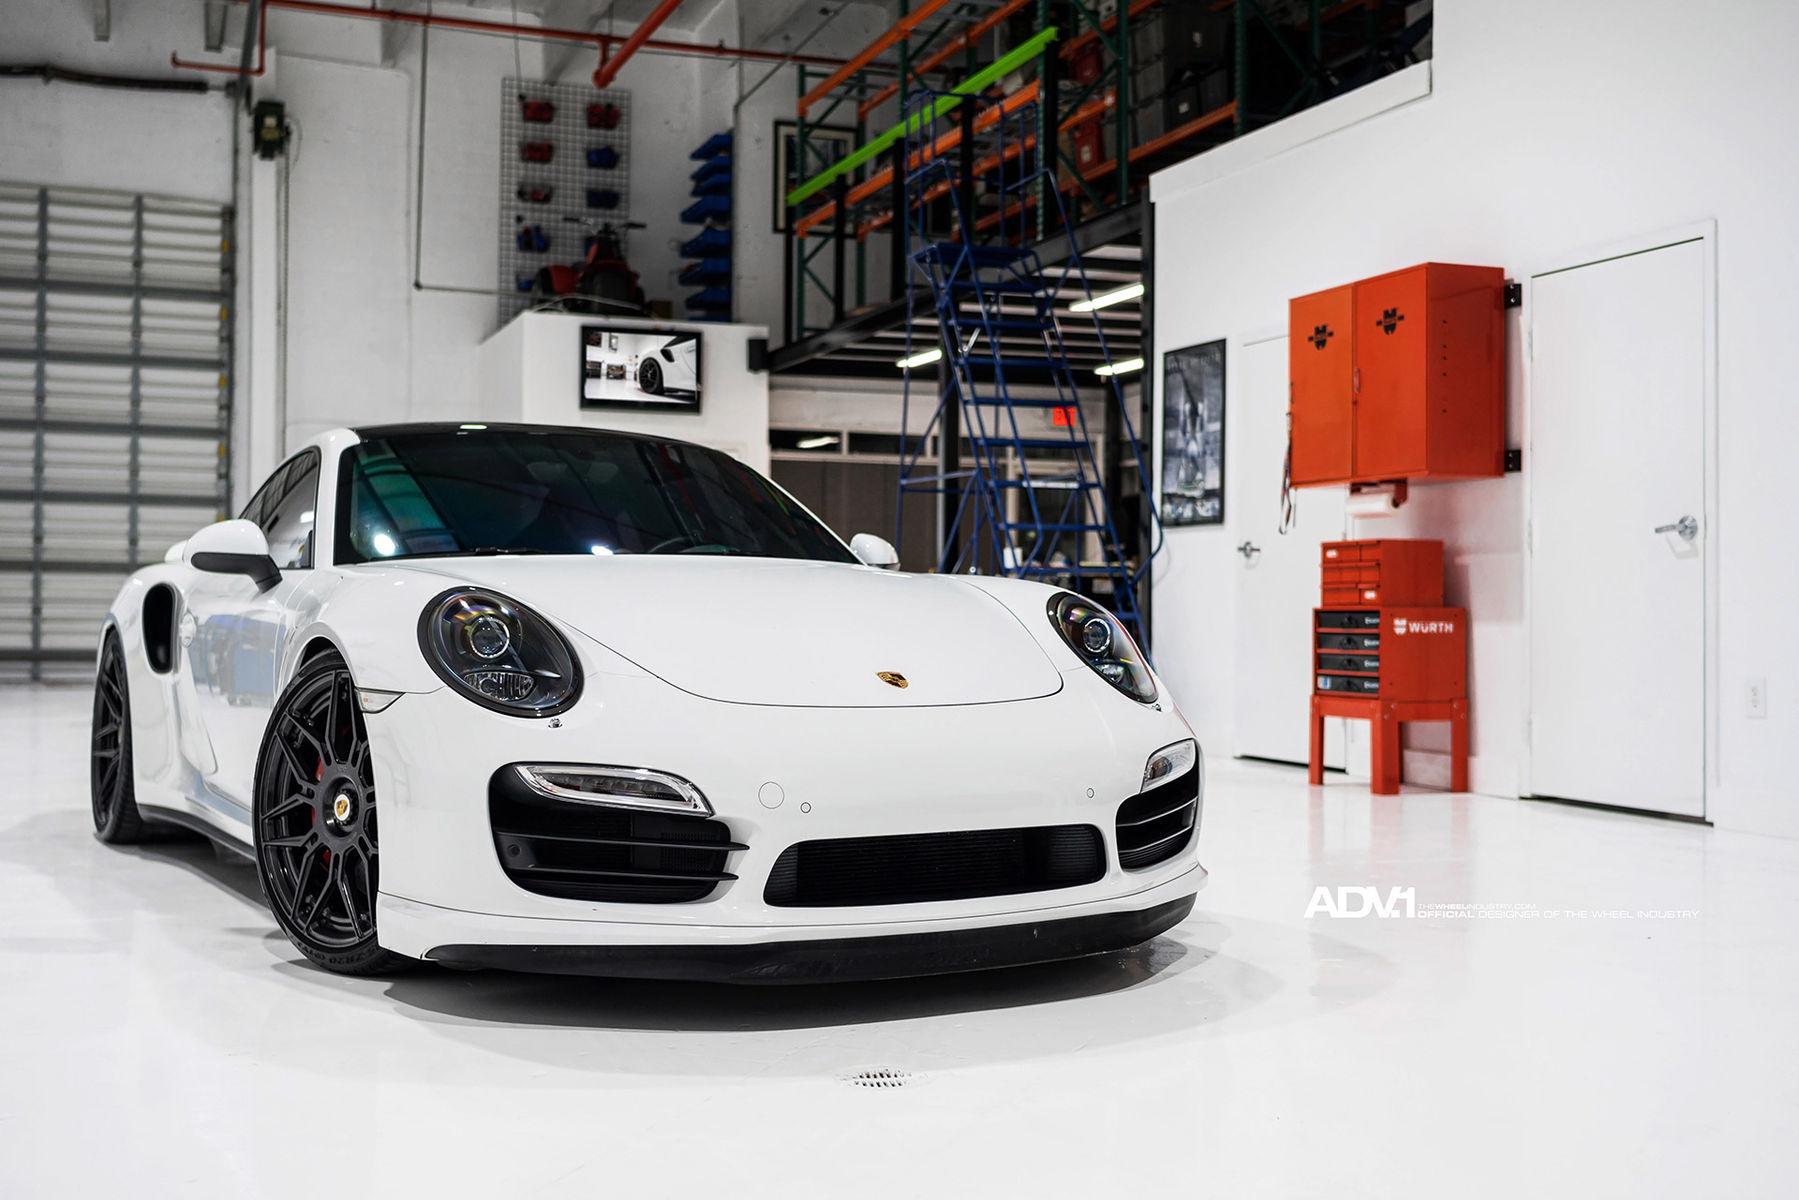 2016 Porsche 911 | ADV.1 Wheel Porsche 991 Turbo S